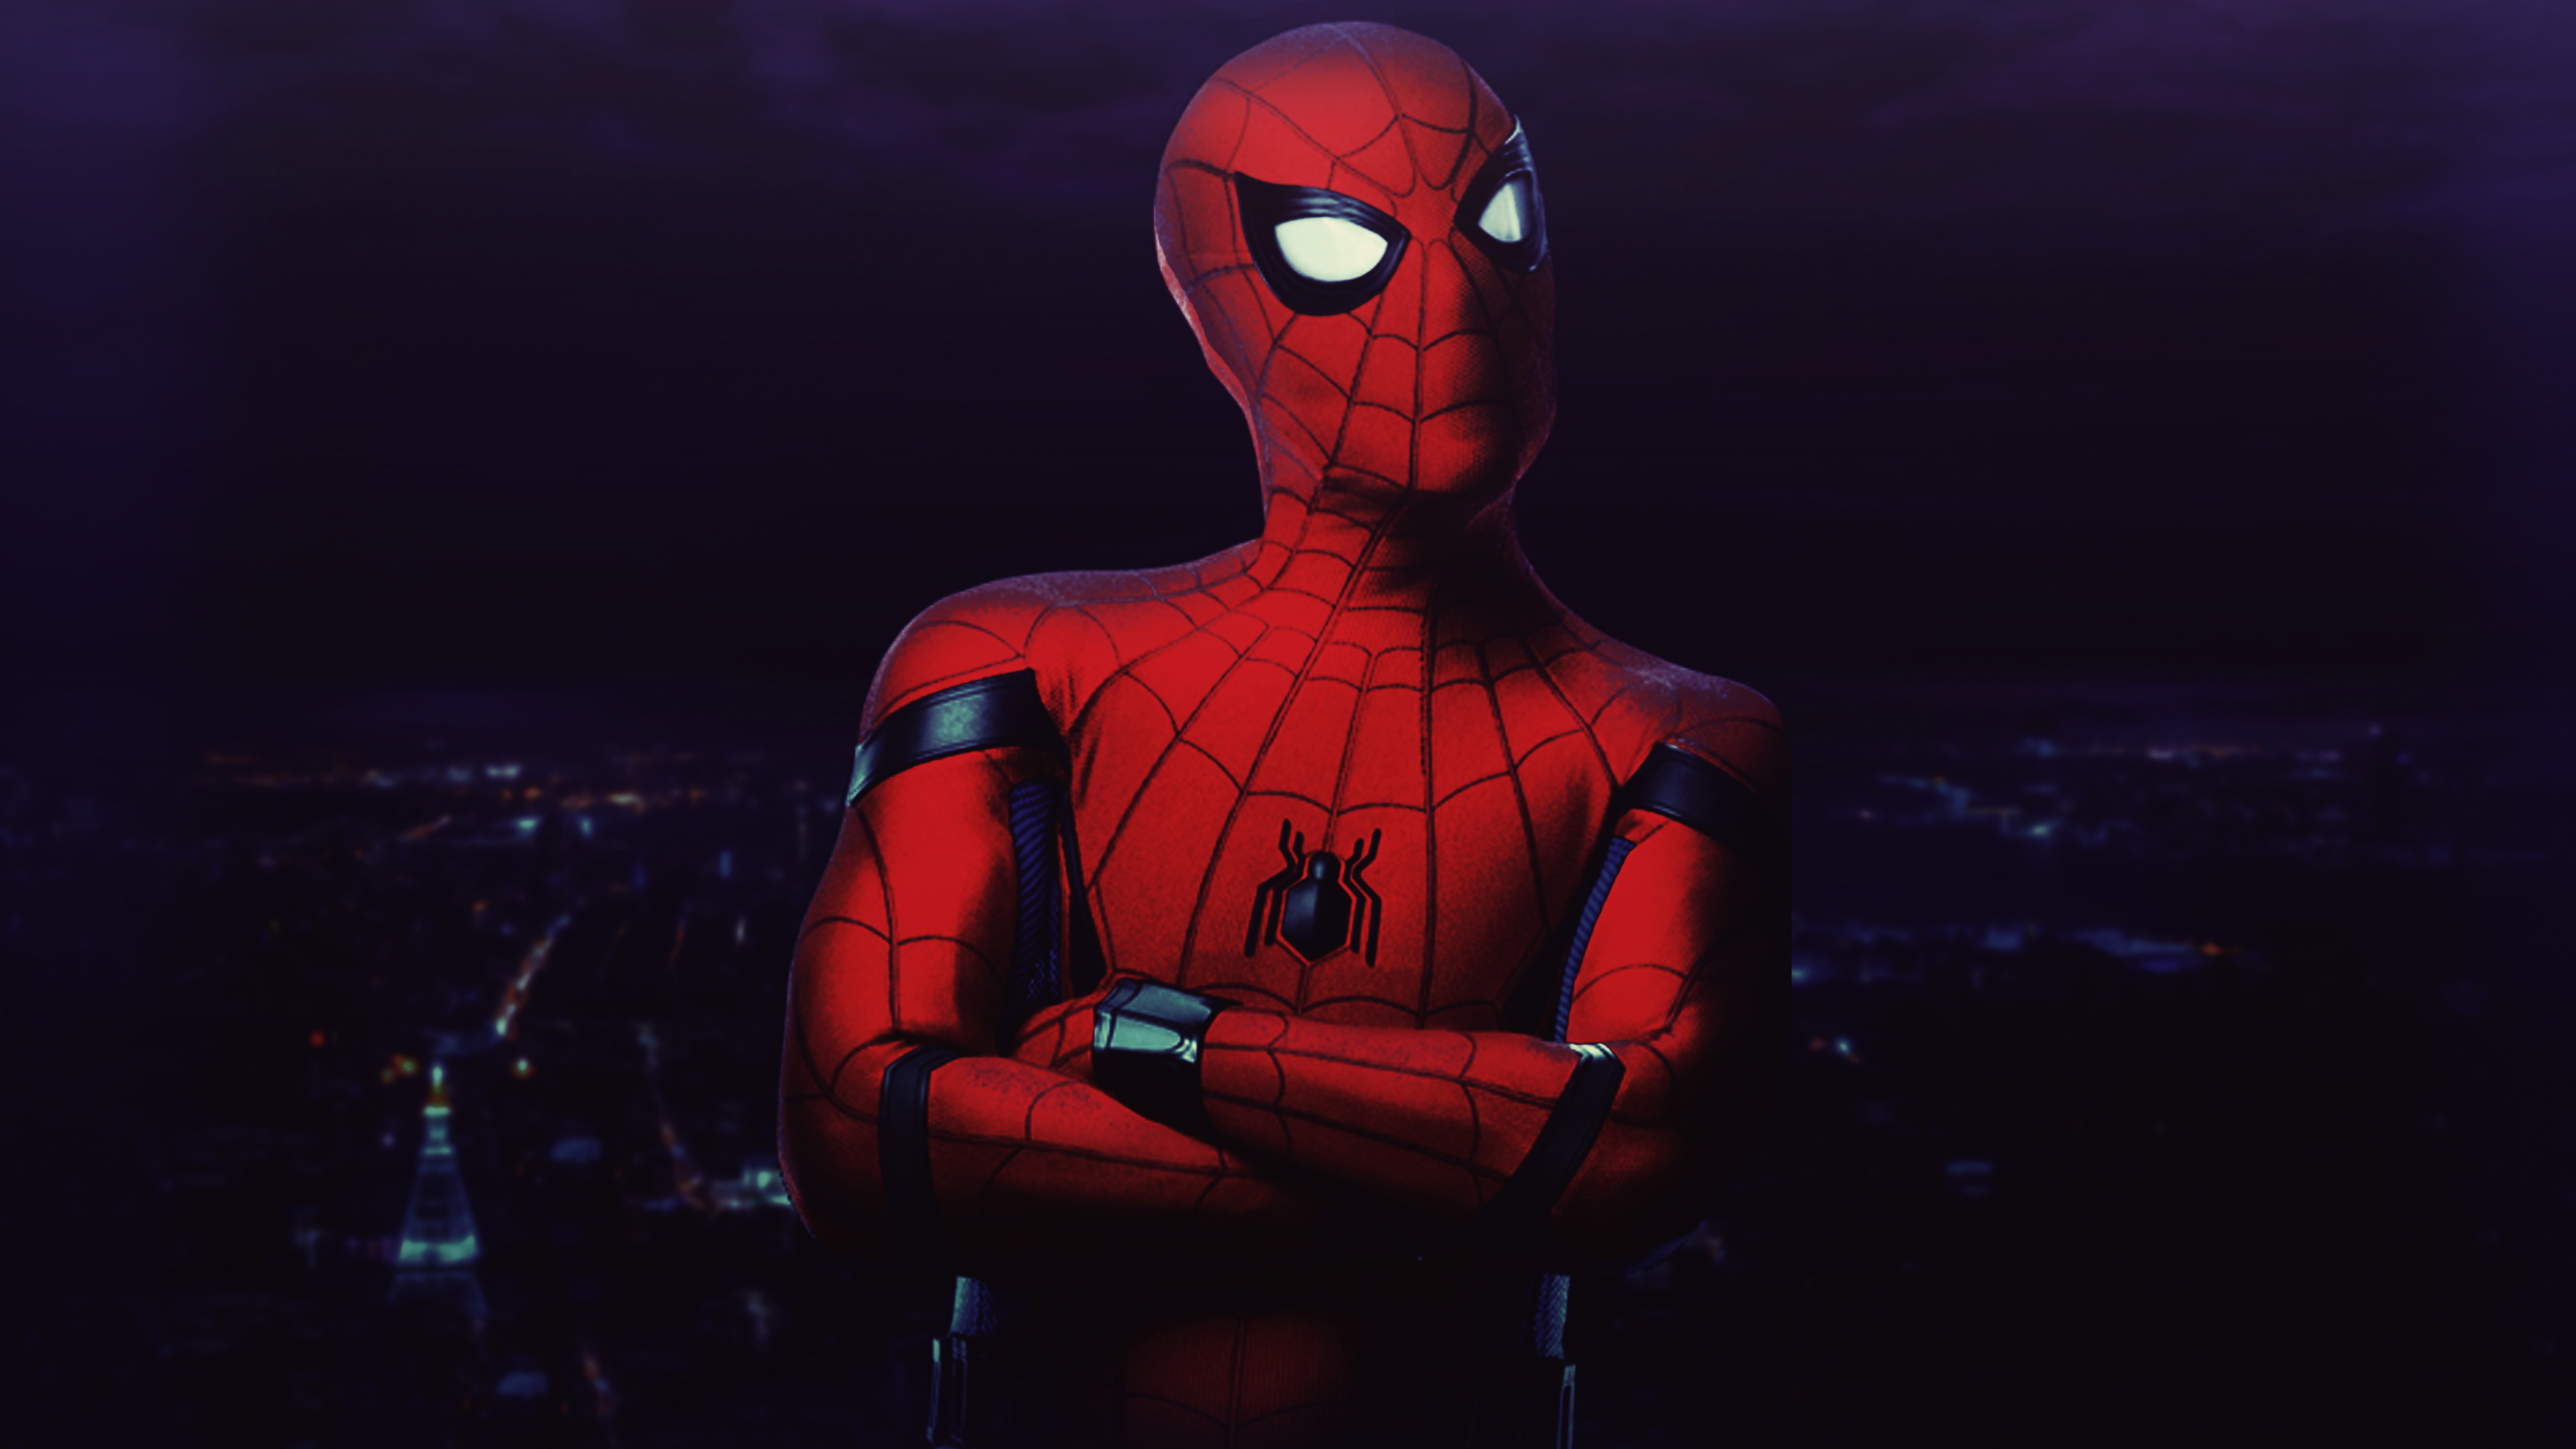 spiderman cosplay 4k 1556184872 - Spiderman Cosplay 4k - superheroes wallpapers, spiderman wallpapers, hd-wallpapers, cosplay wallpapers, behance wallpapers, 4k-wallpapers